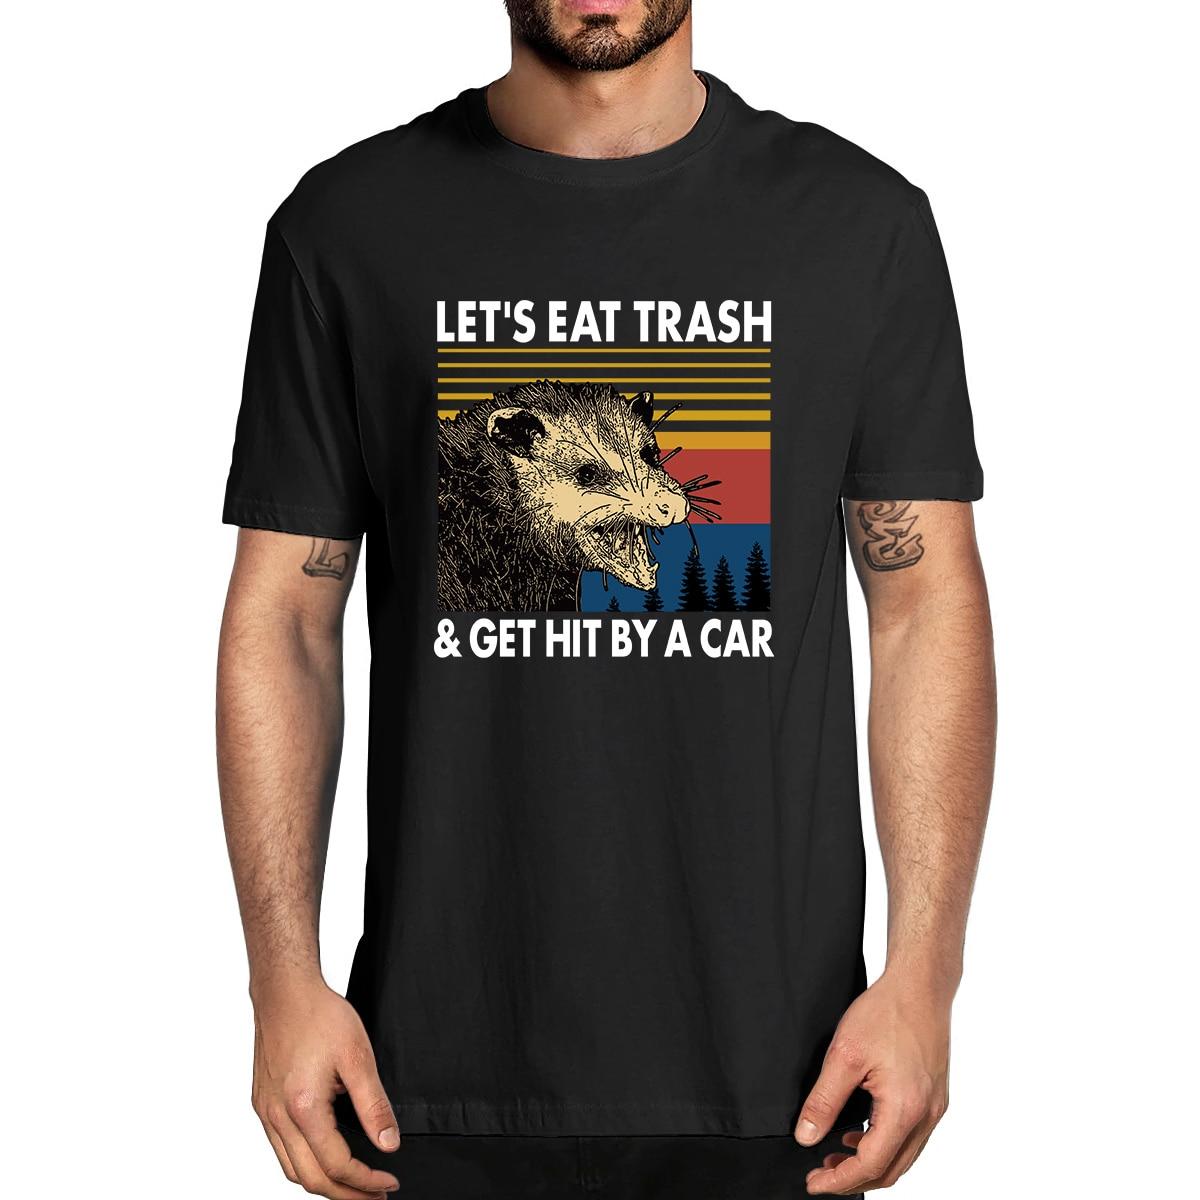 Raccoon Let's Eat Trash & Get Hit By A Car 100% Cotton Shirt Novelty Vintage Men's T-Shirt Humor Women Top Tee Humor Streetwear